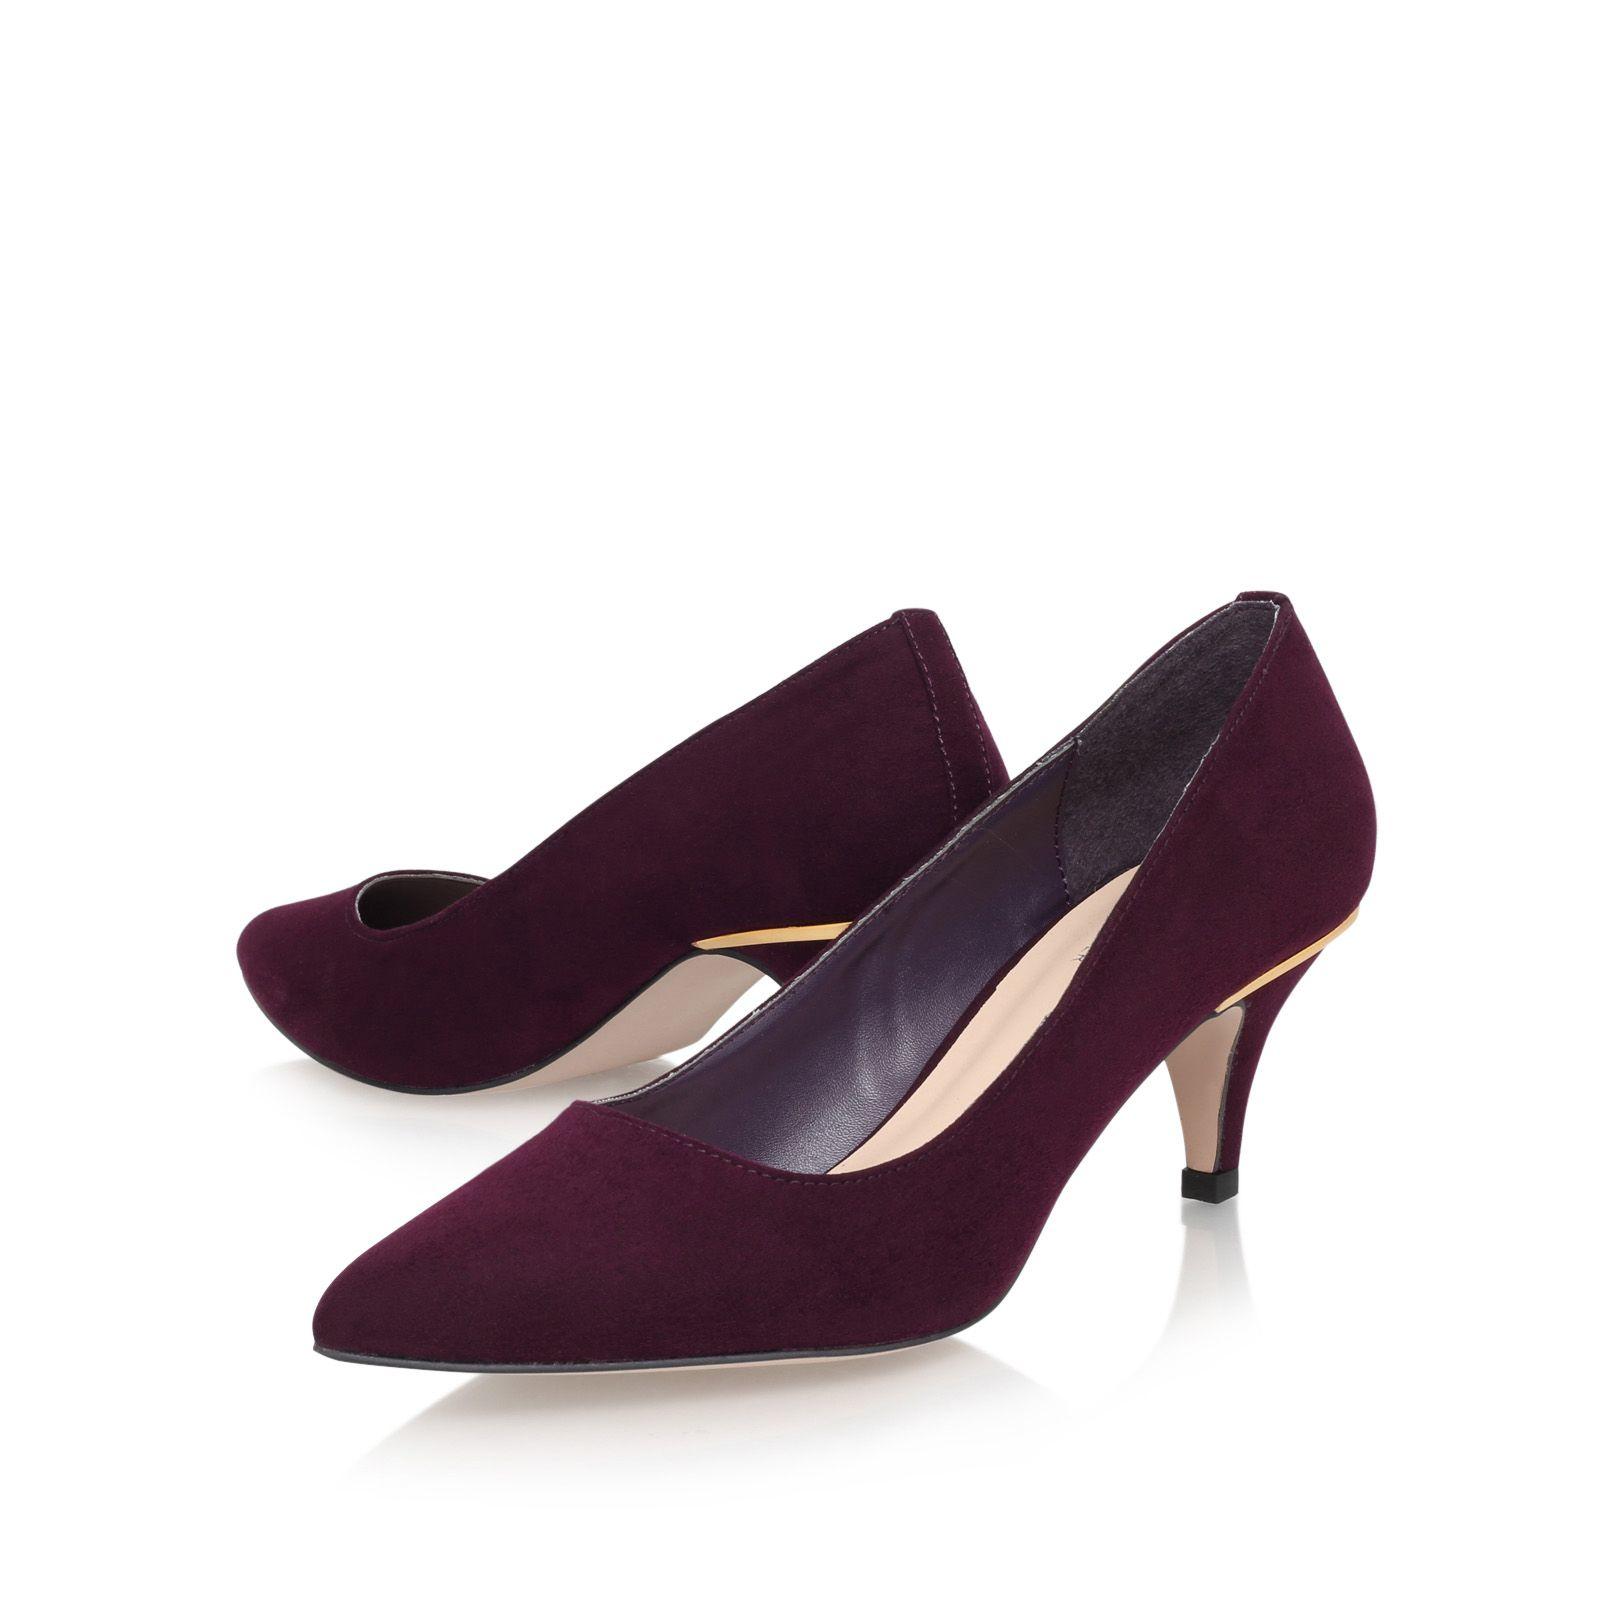 Aldo Red Court Shoes